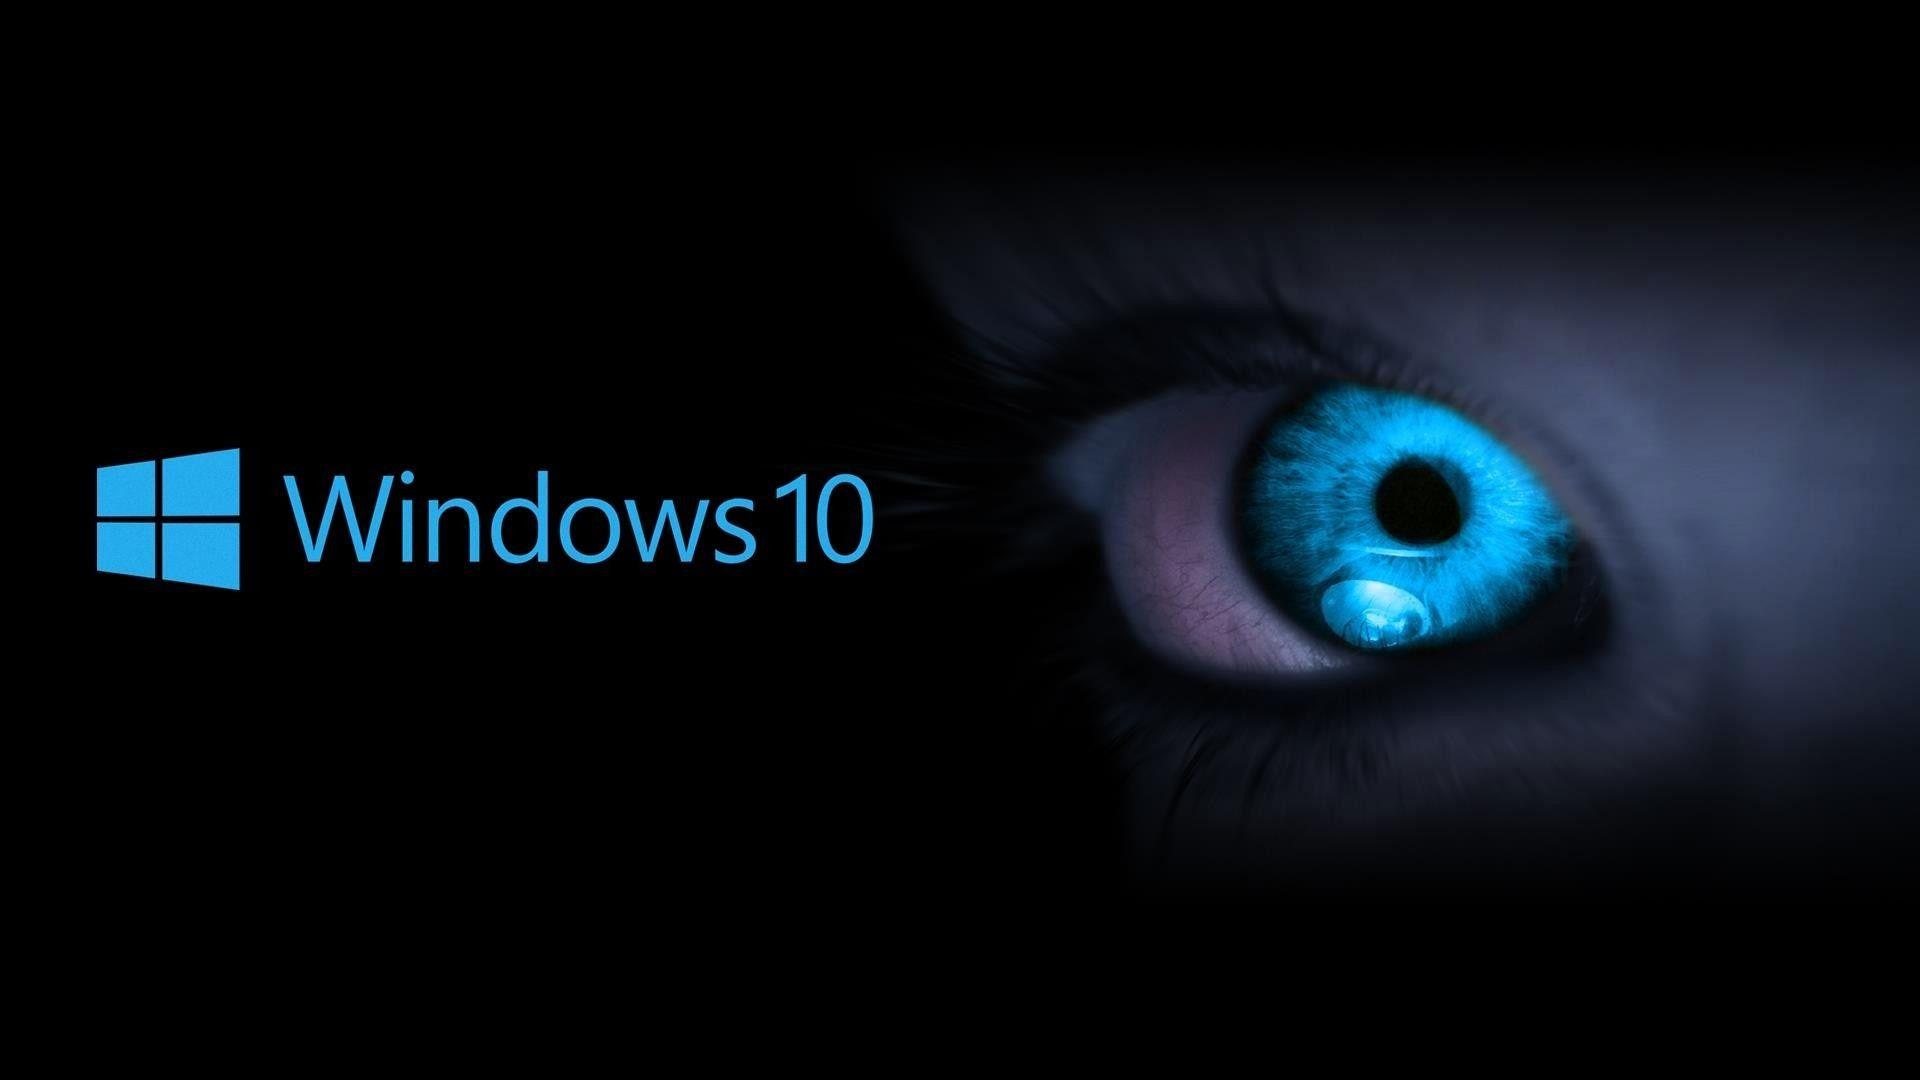 20 Cortana Computer Code Wallpapers   Download at WallpaperBro 1920x1080